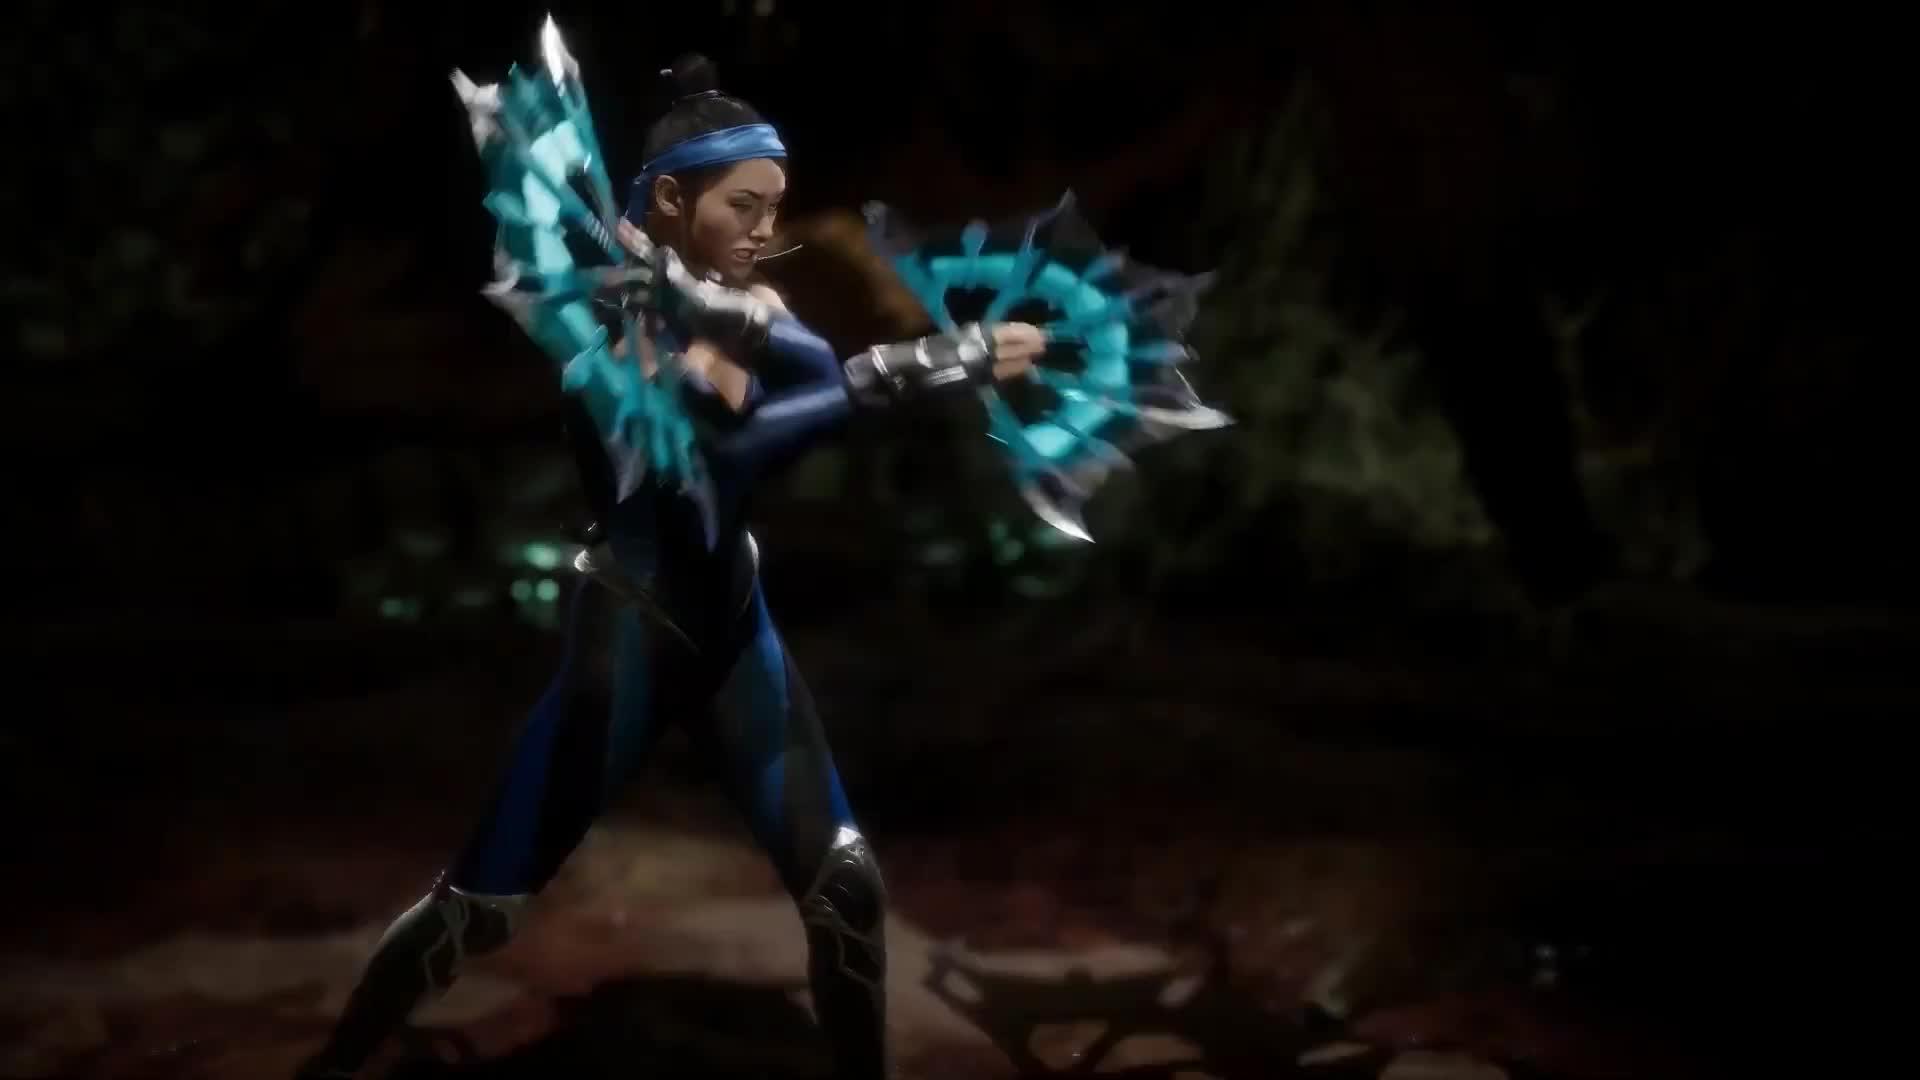 Fatality, Kitana, MK11, Mortal Kombat 11, MK11 Kitana's Fatality GIFs